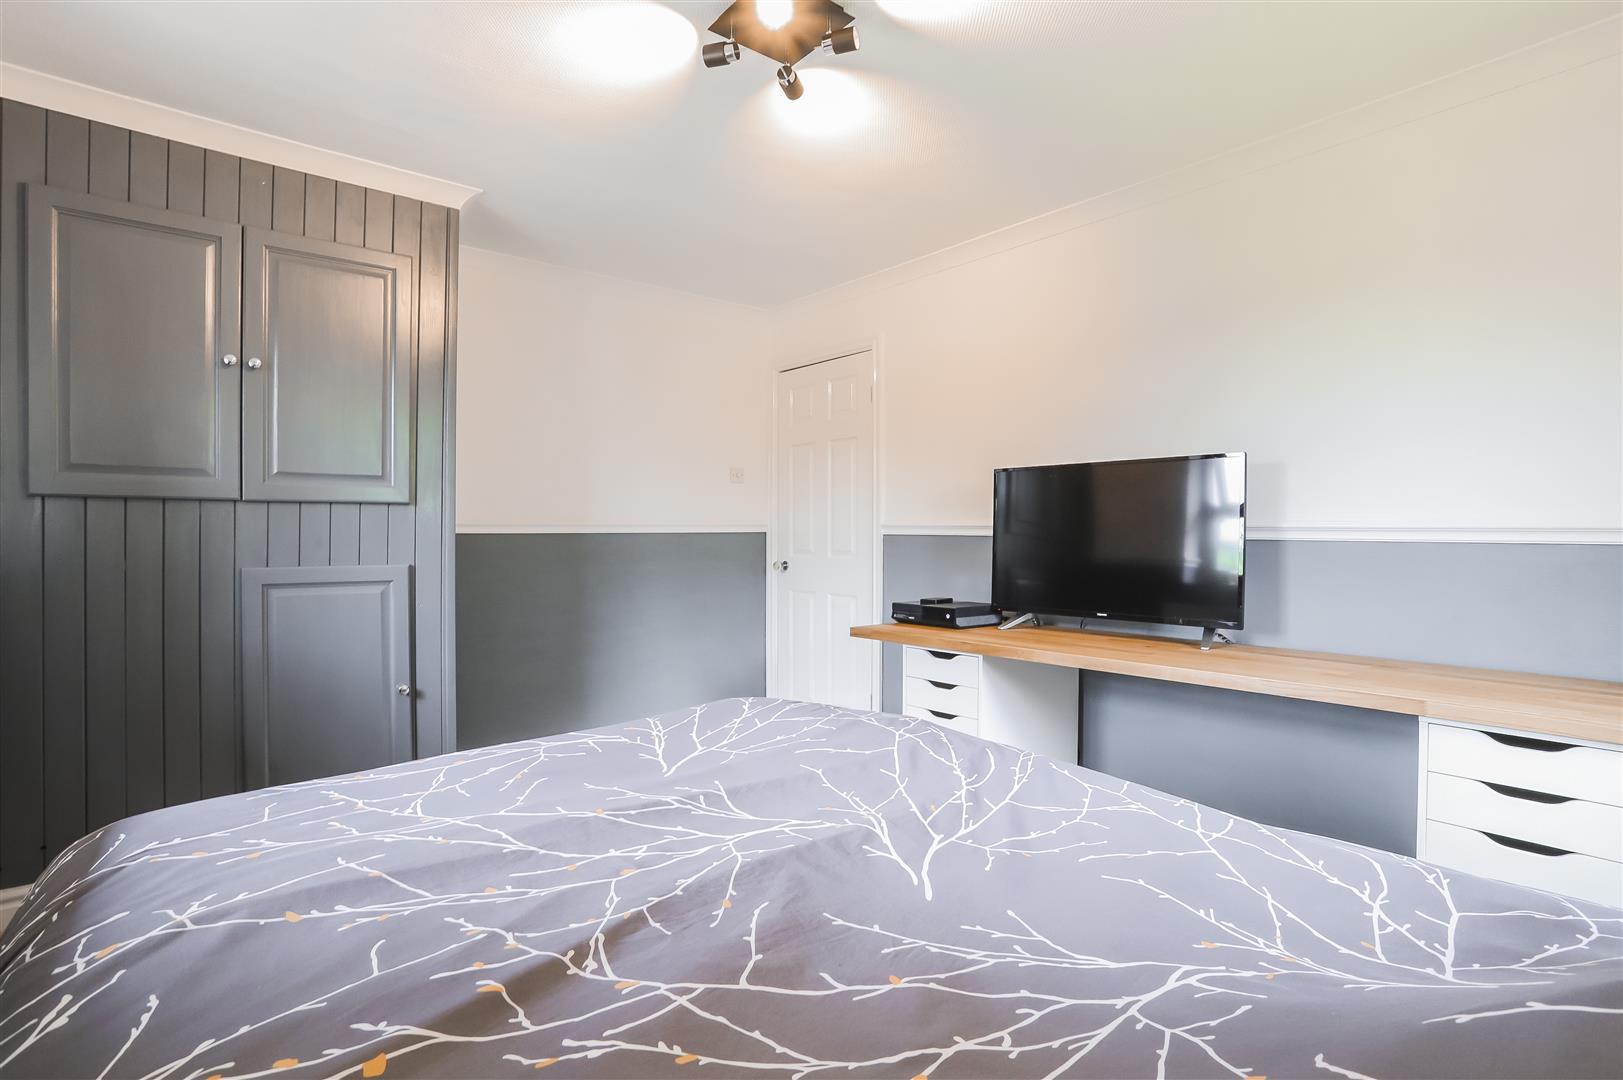 4 Bedroom Detached House For Sale - second bedroom